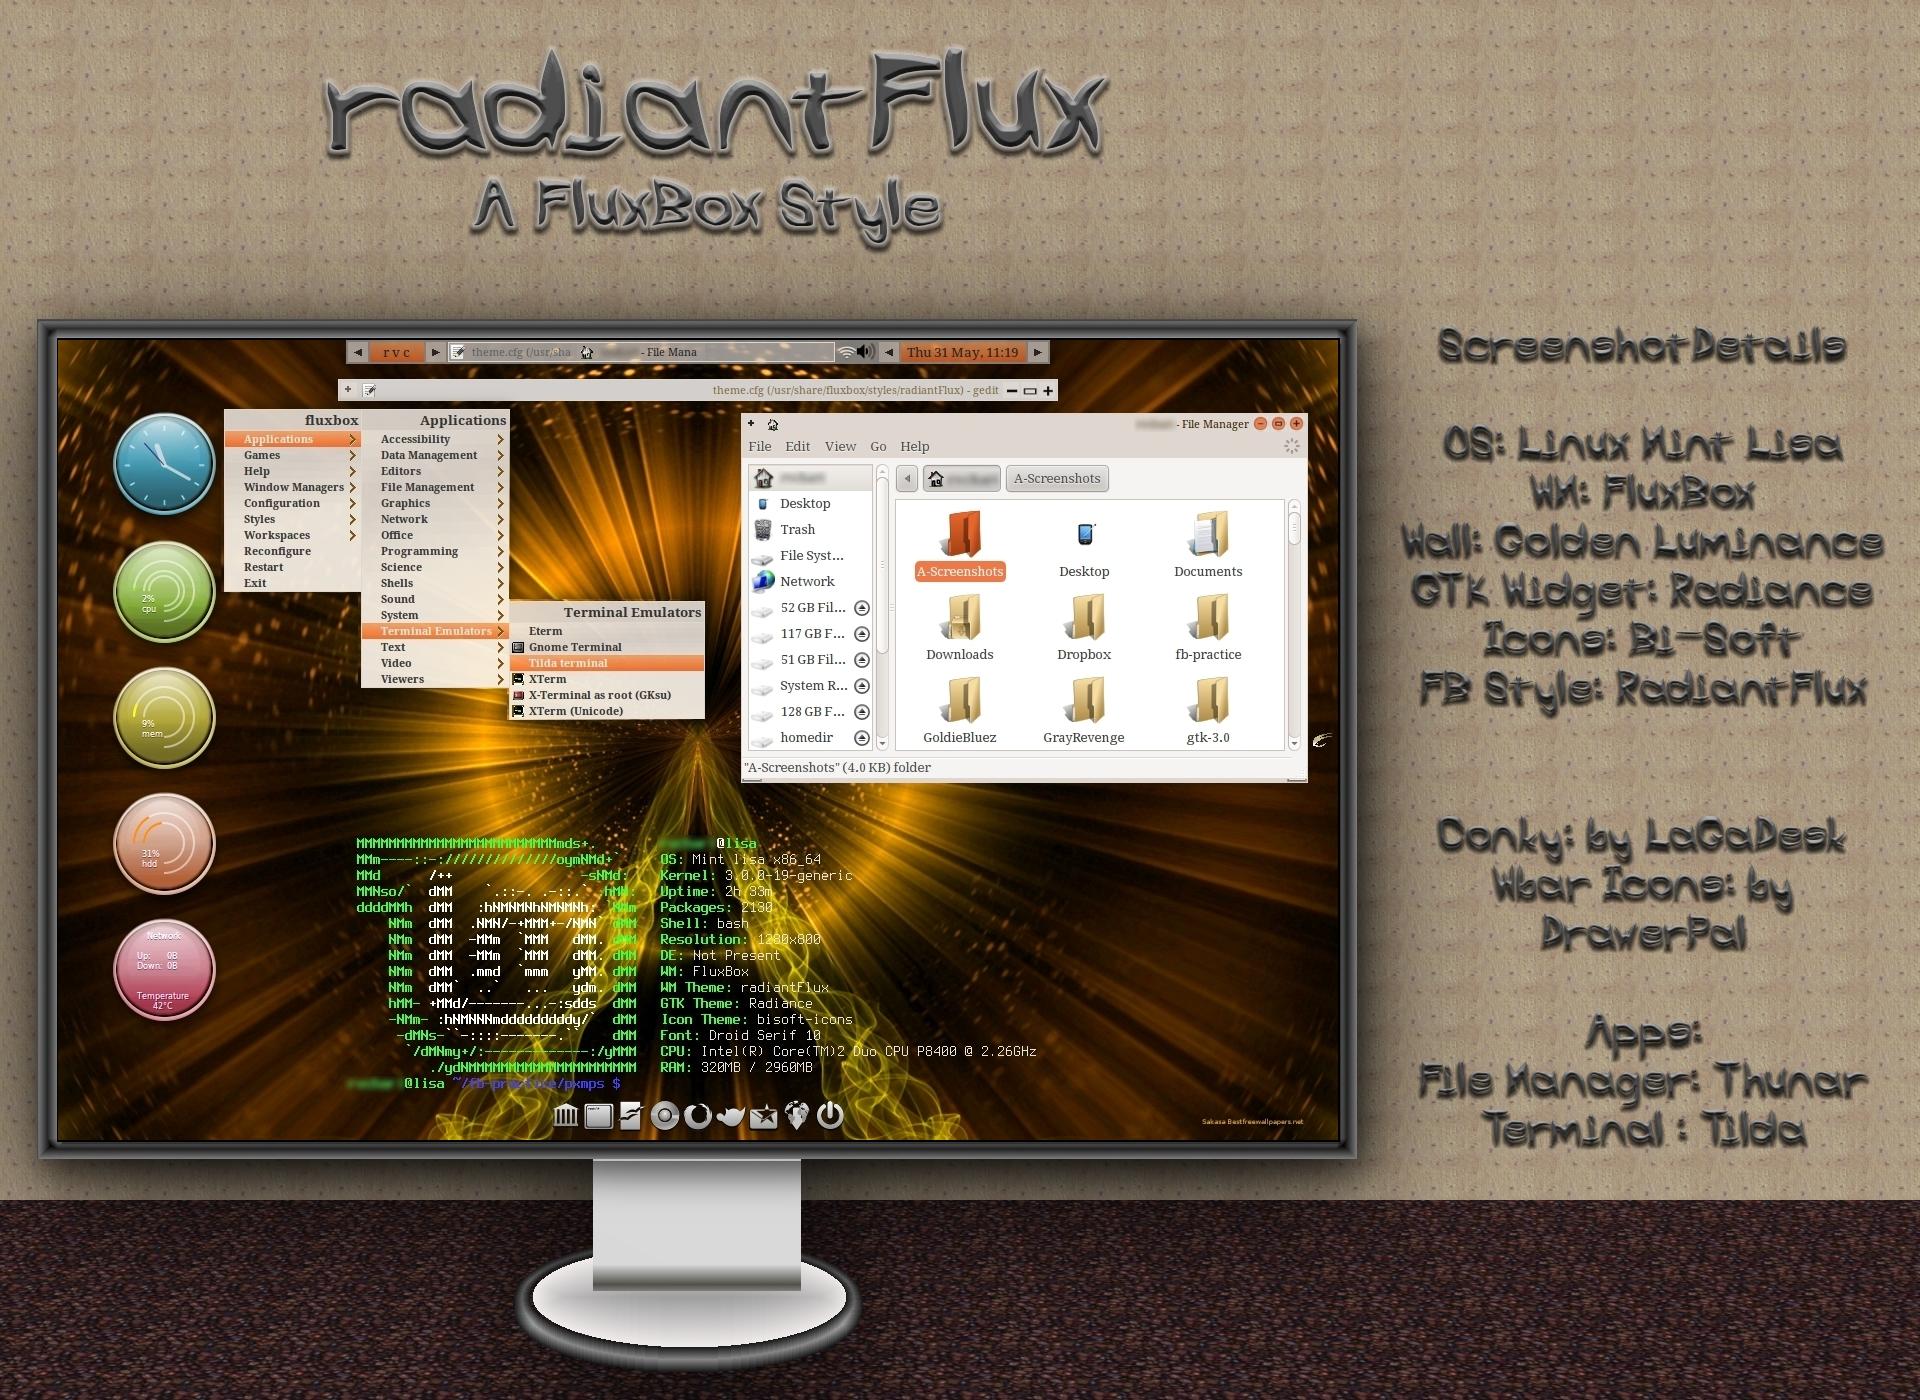 radiantFlux - A FluxBox Style by rvc-2011 on DeviantArt